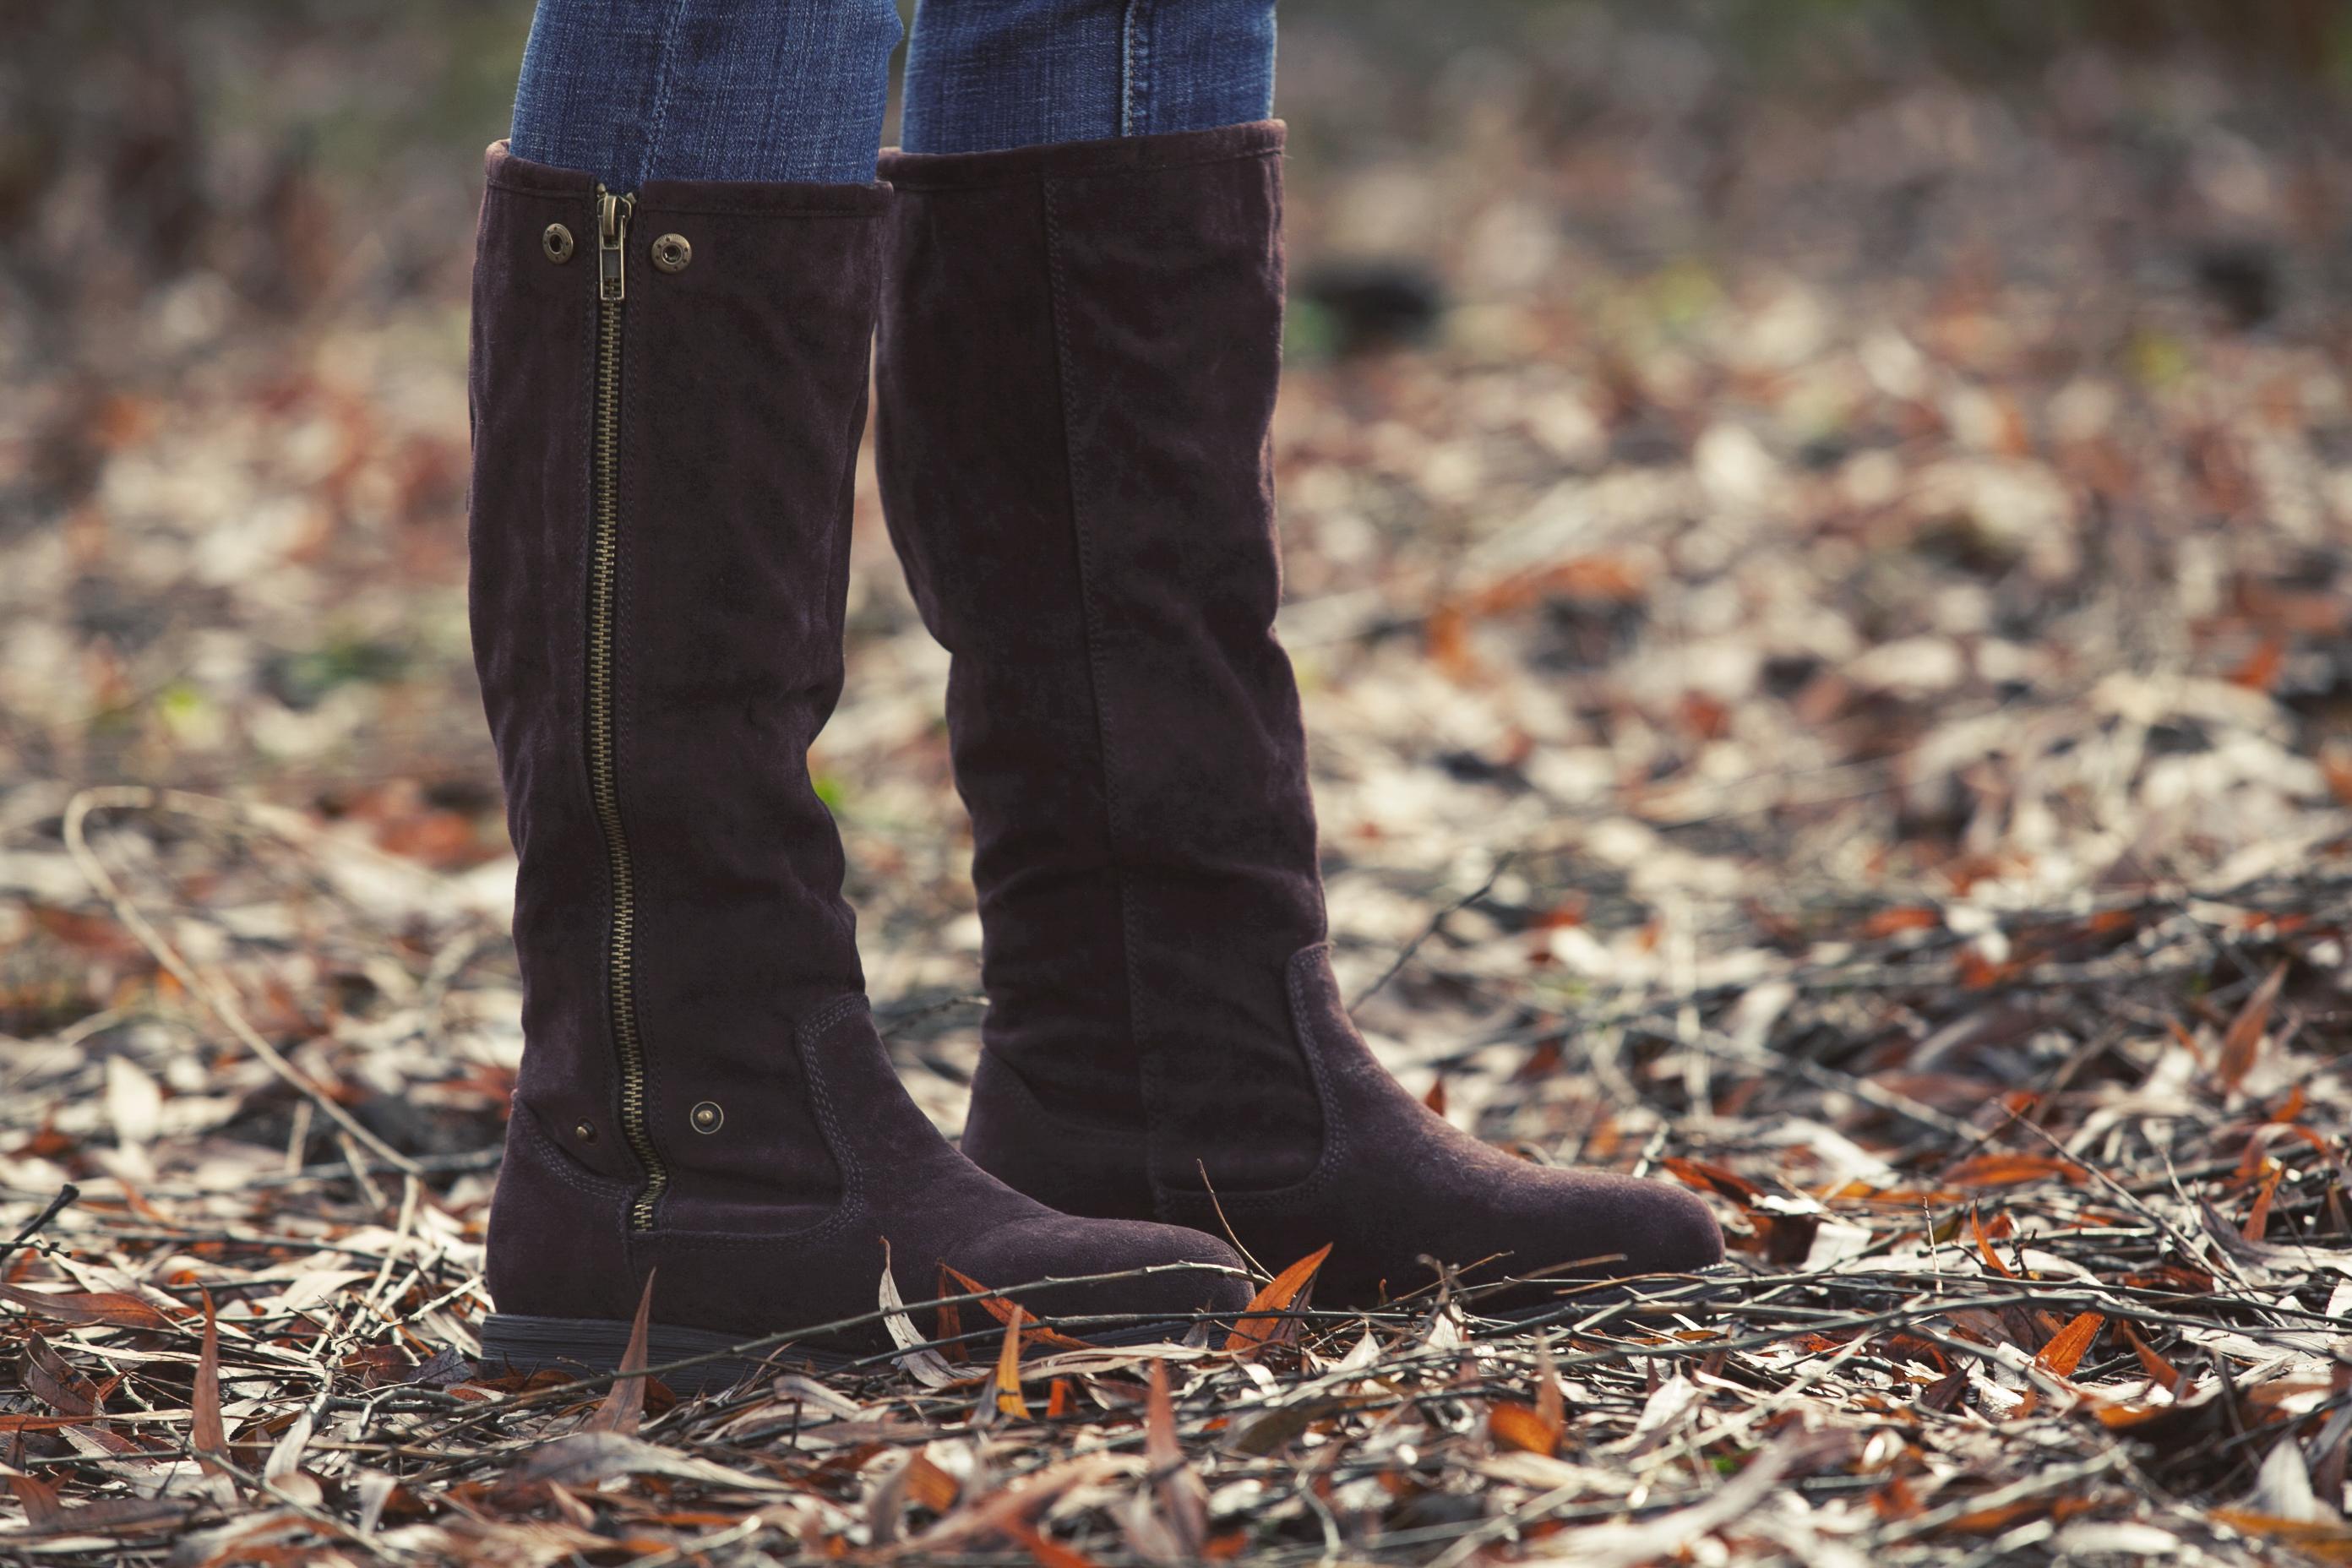 8f17cff04bf MUK LUKS® Women's Demi Boots – Dark Brown | Slippers.com - Shop Comfy